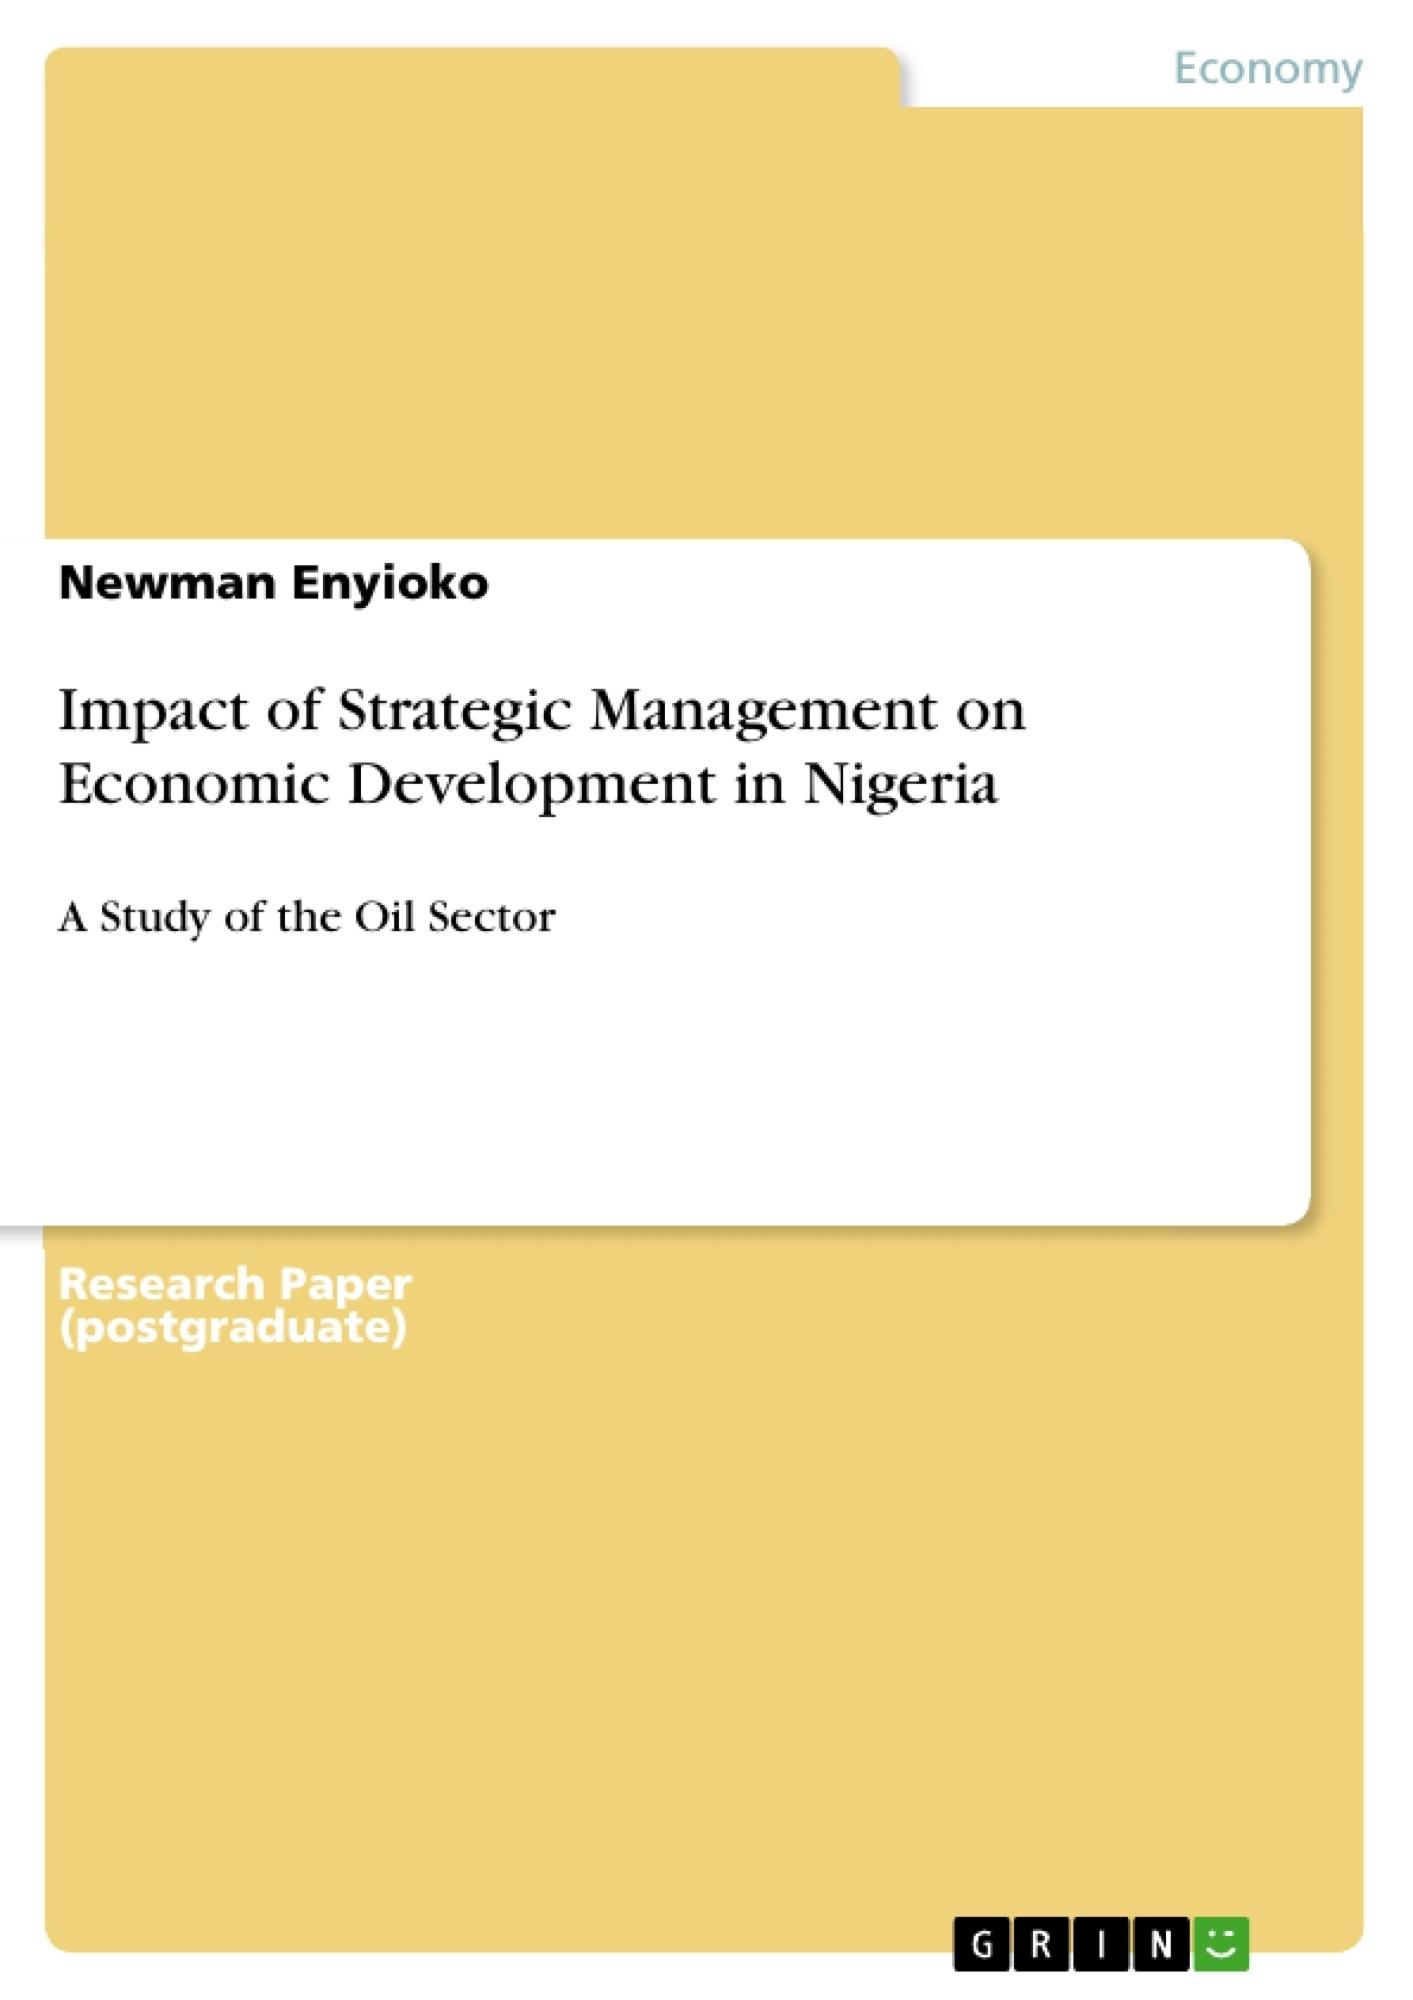 Title: Impact of Strategic Management on Economic Development in Nigeria